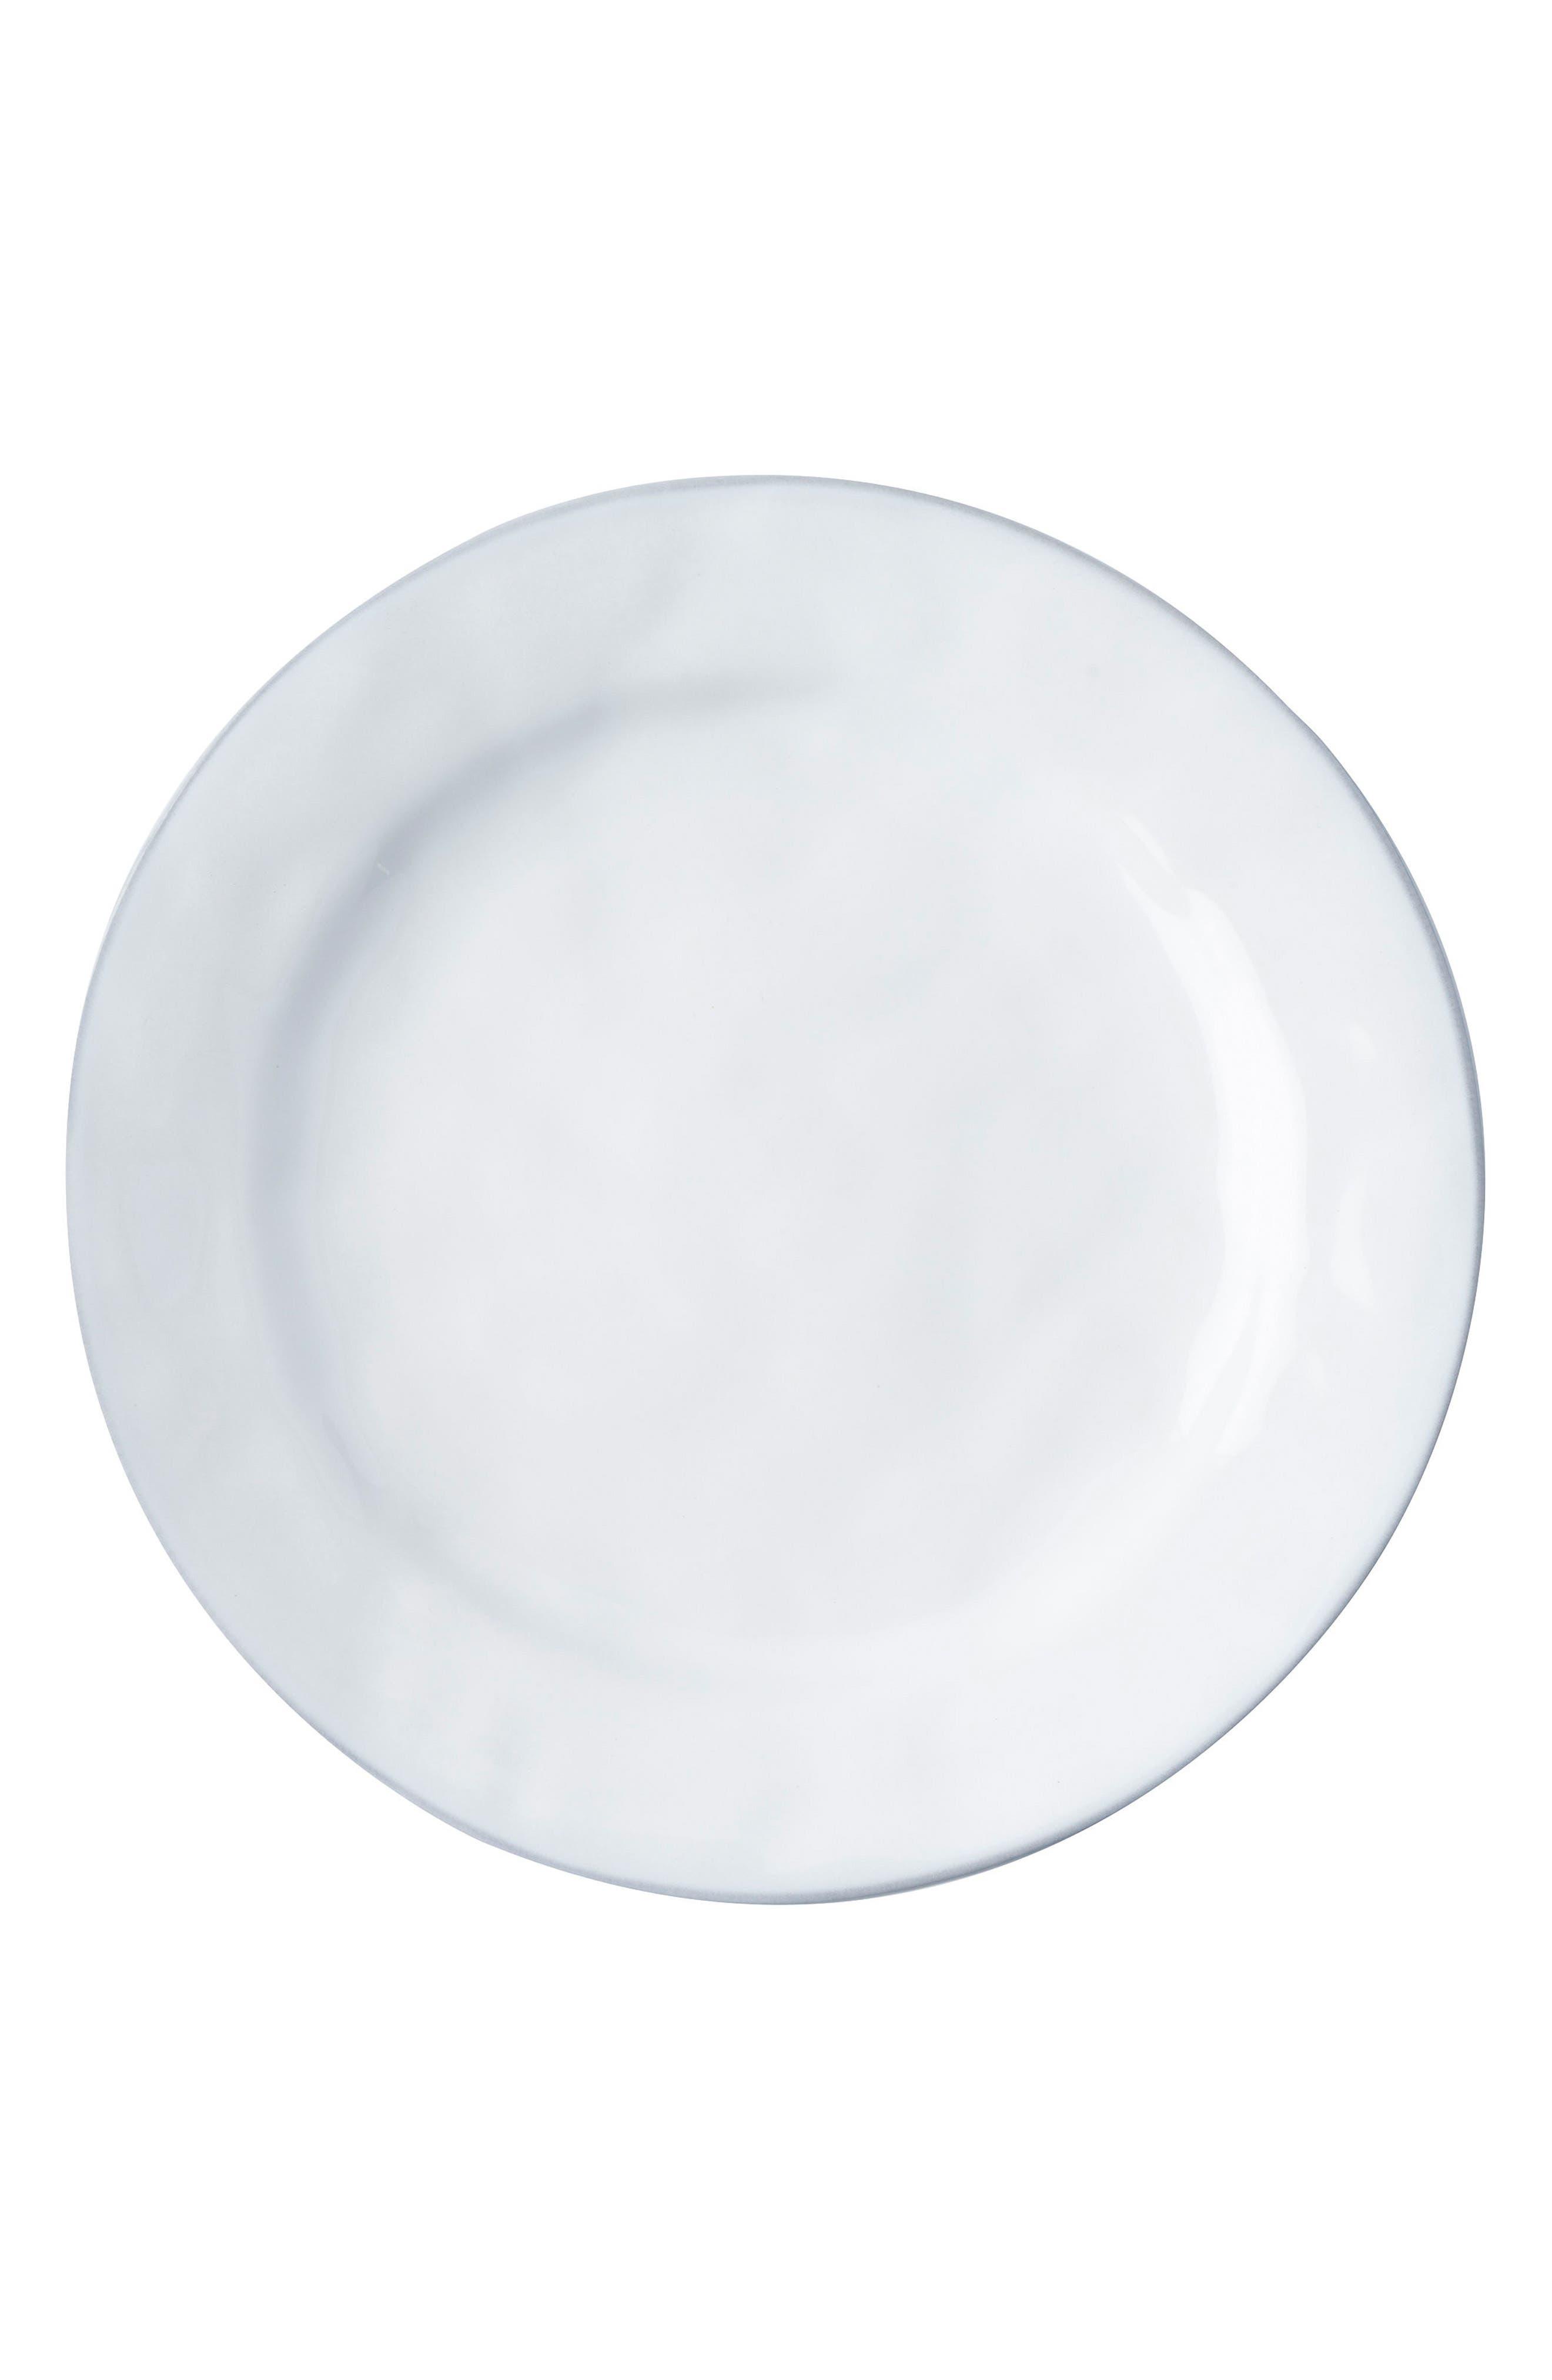 Quotidien White Truffle Ceramic Dinner Plate,                         Main,                         color, WHITE TRUFFLE